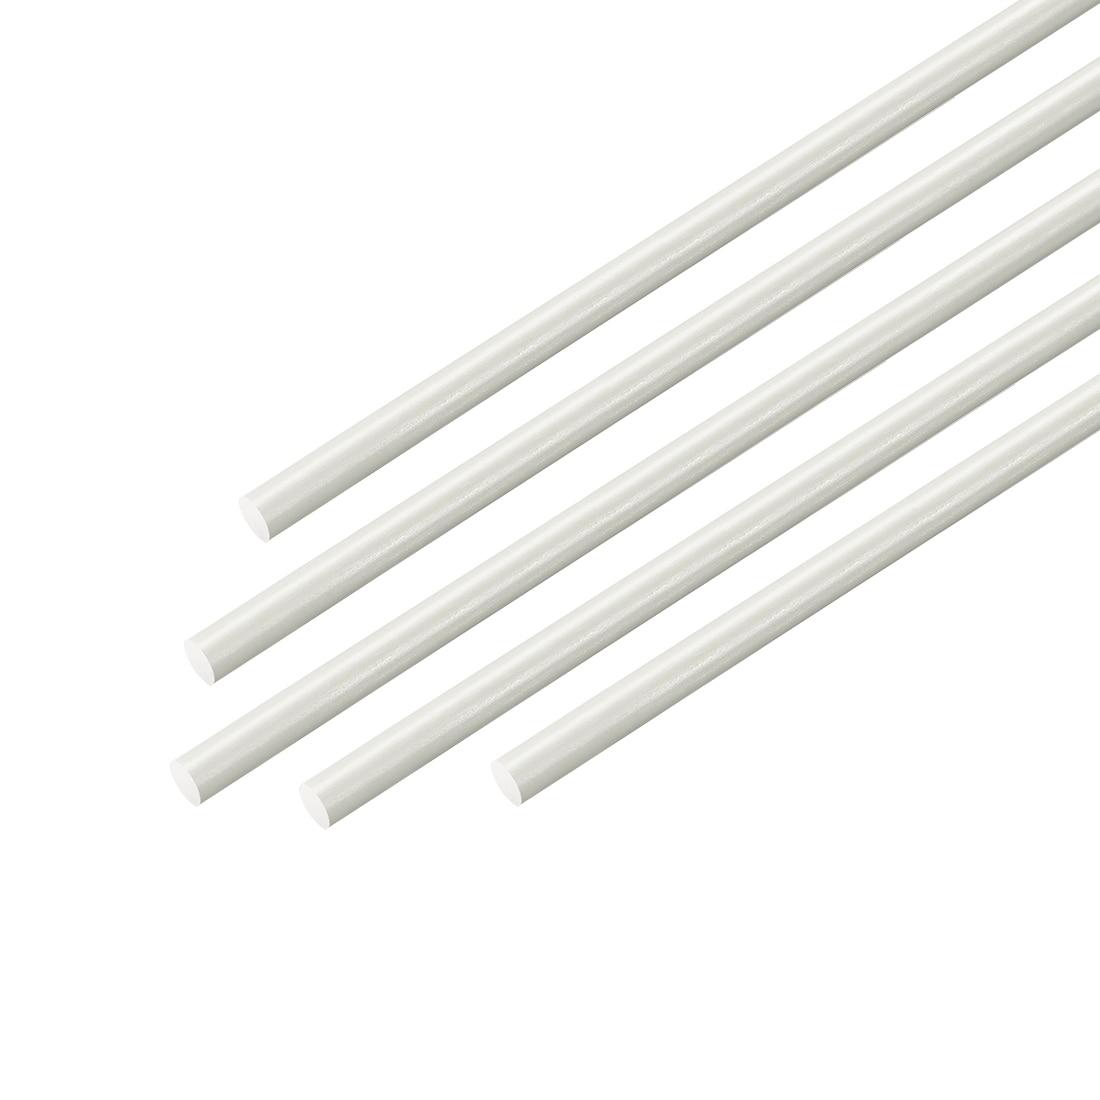 Barra redonda de engenharia preta 5 pces 1.5mm 5 pces branco da fibra de vidro de uxcell frp haste redonda, diâmetro de 2.5mm 50cm de comprimento